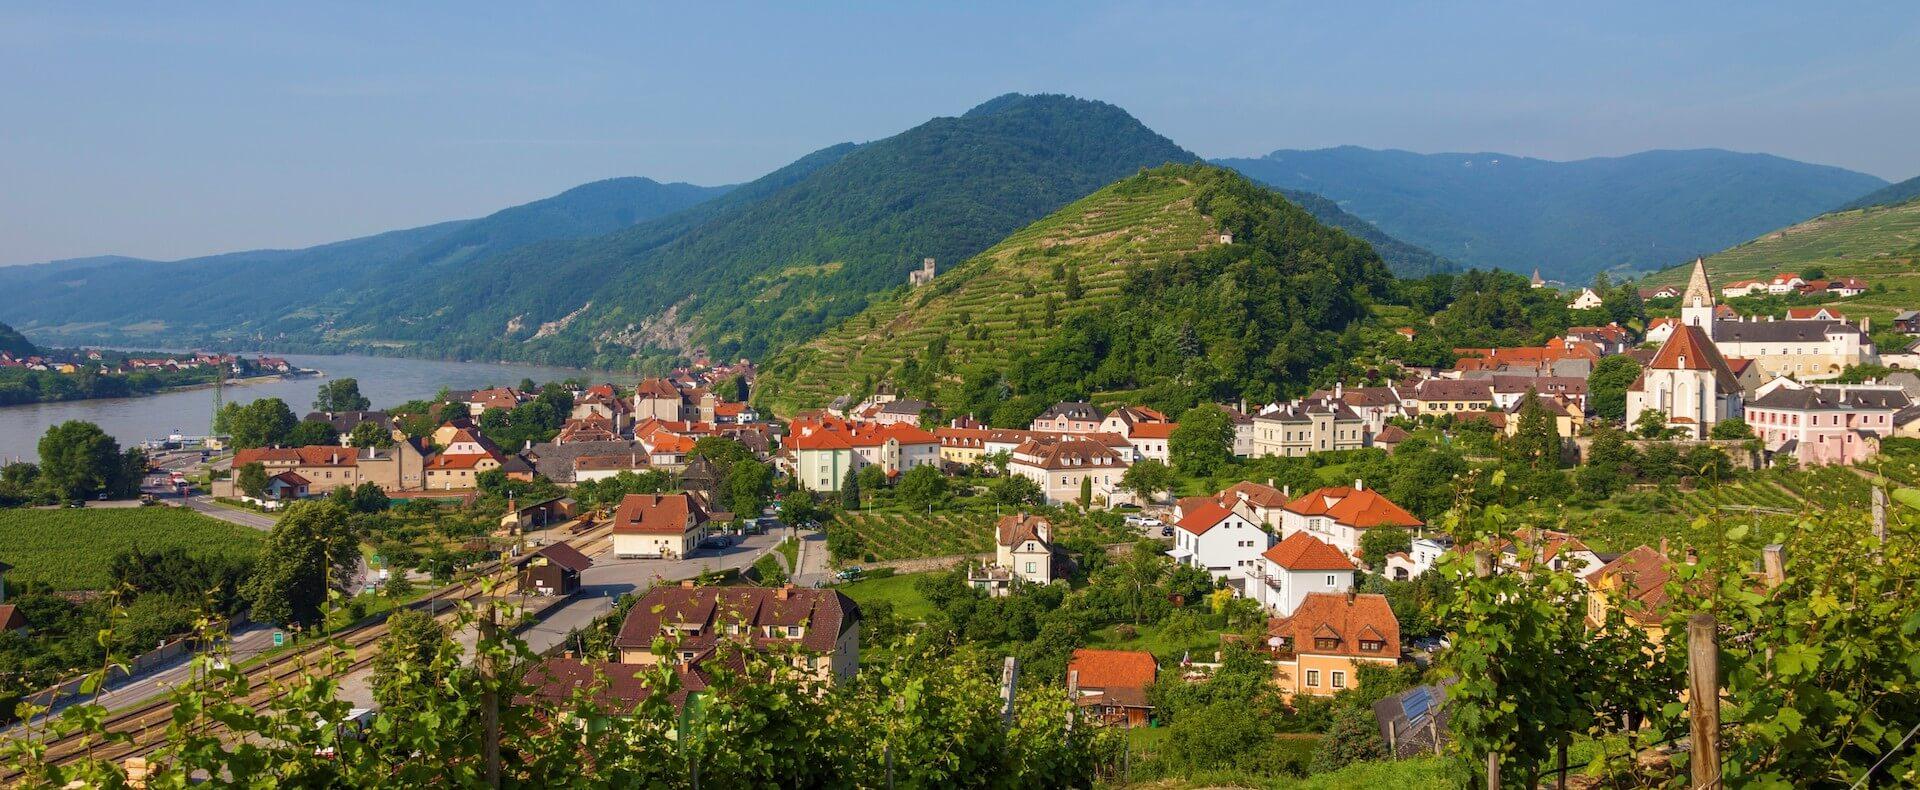 Spitz an der Donau Wachau